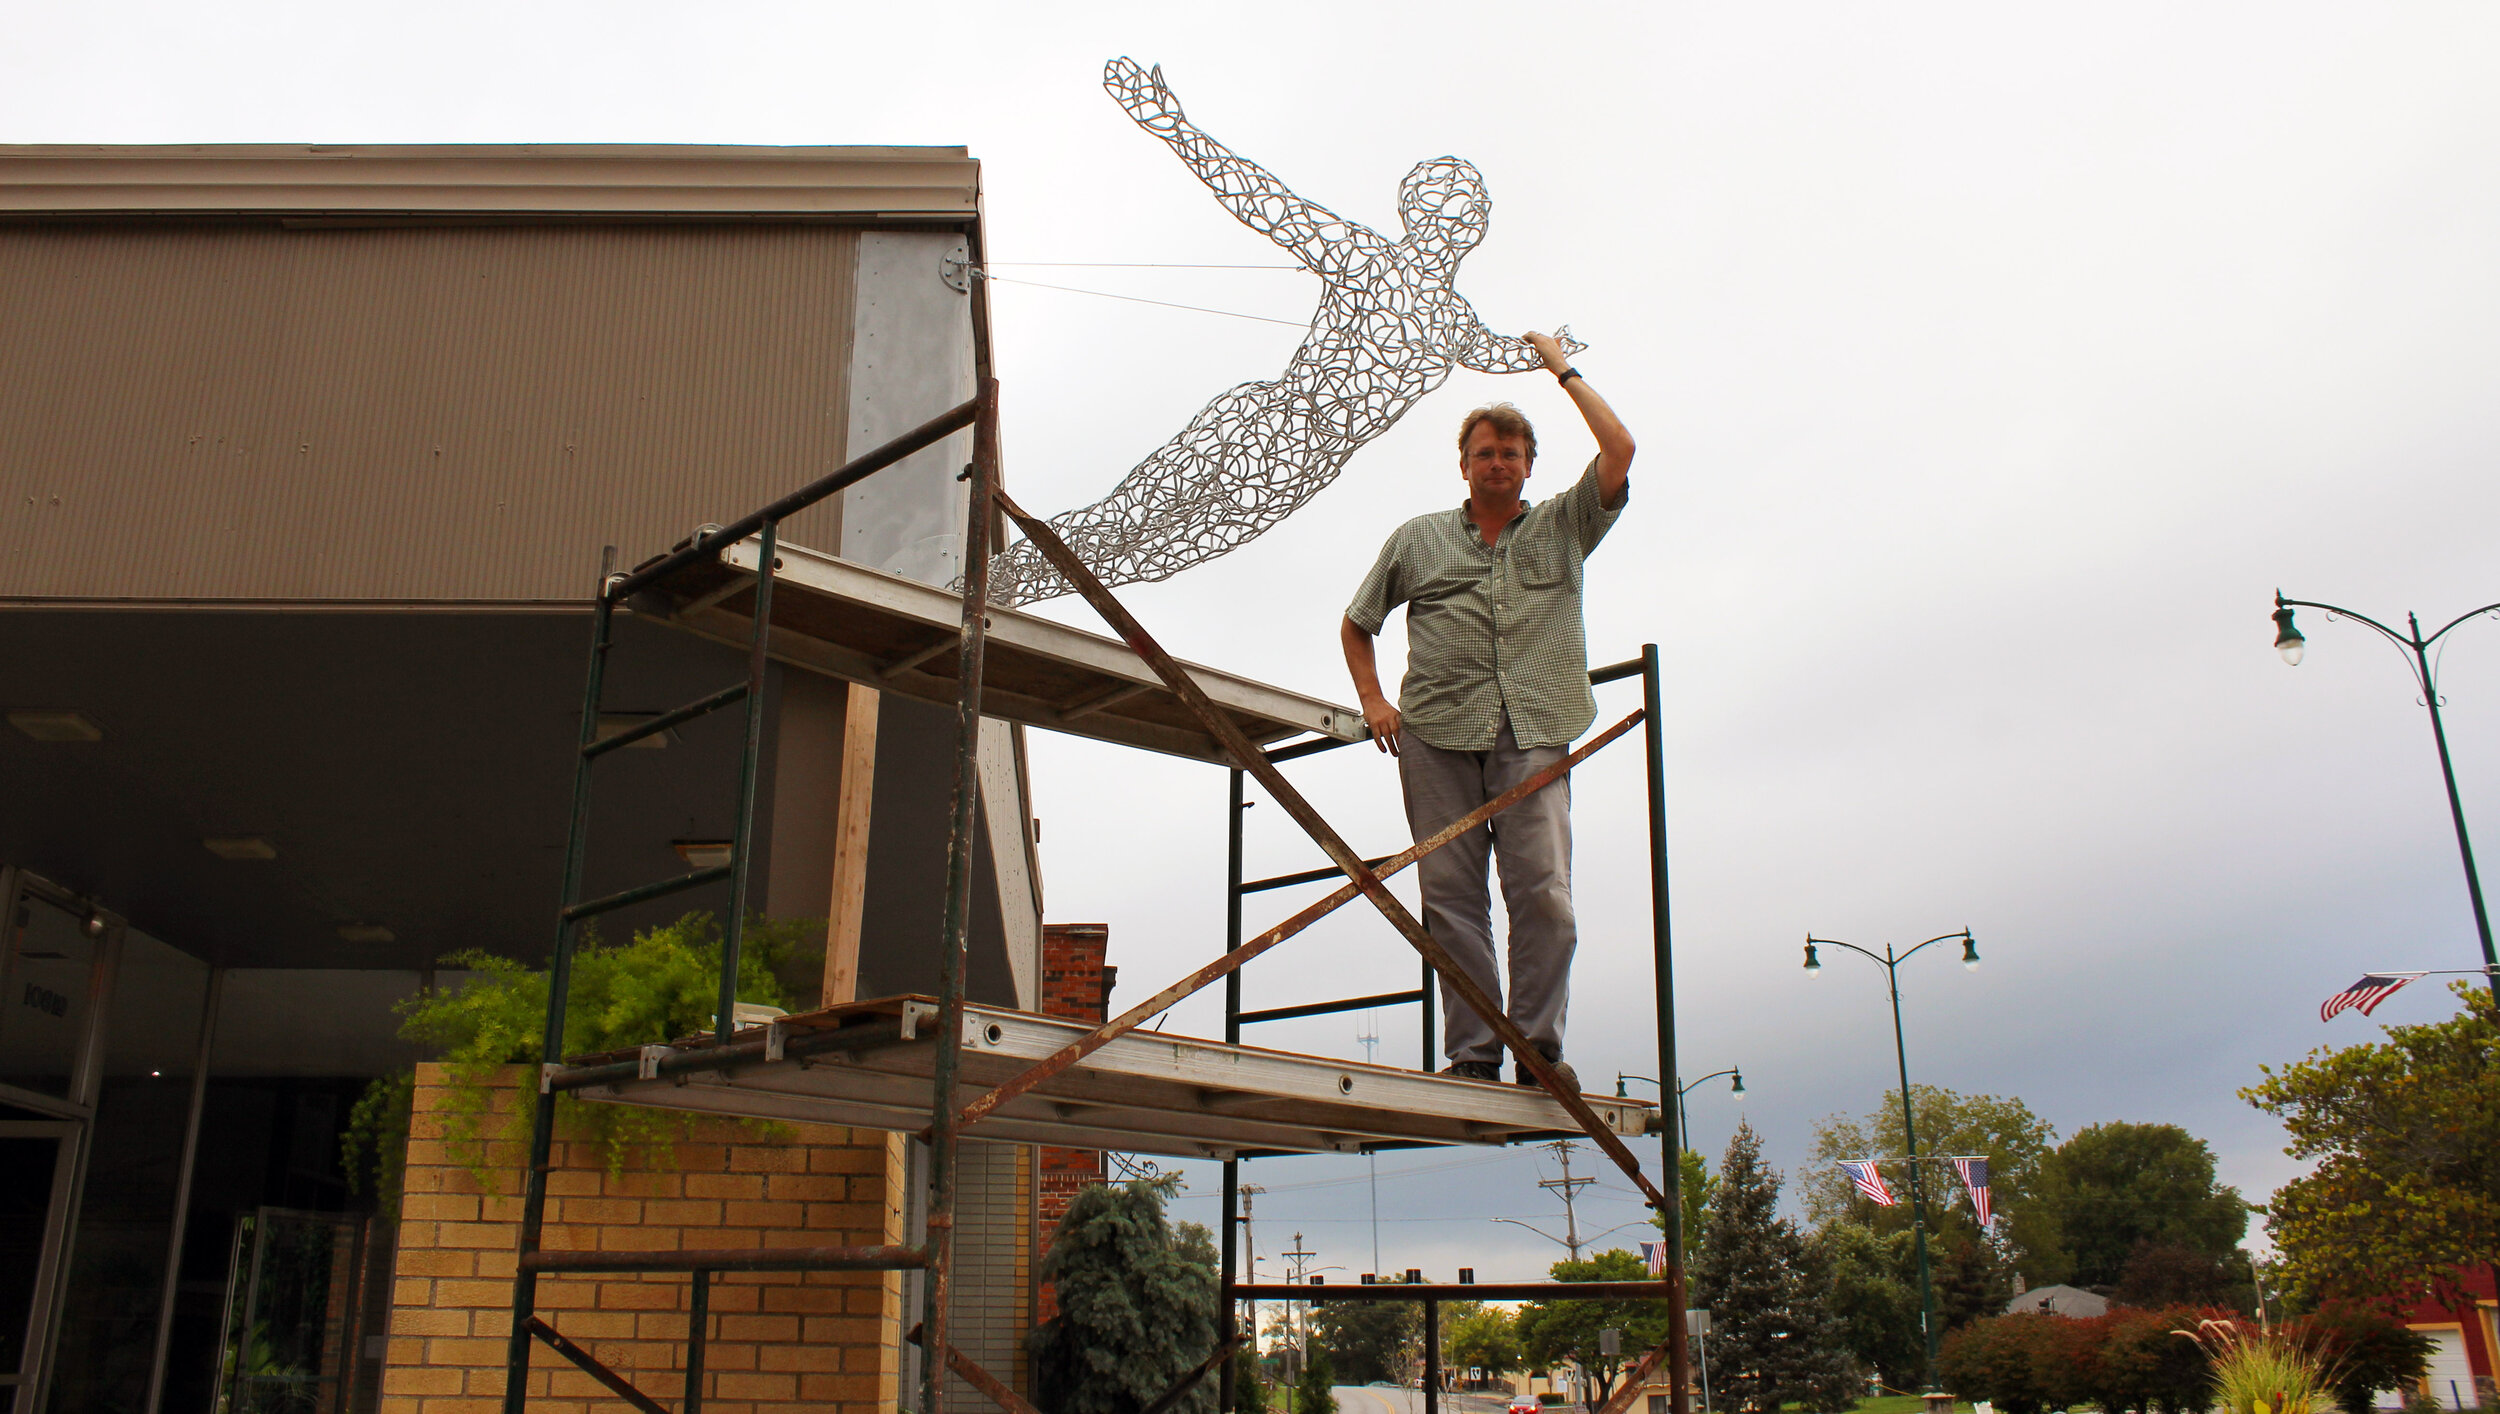 swan-diver-sculpture-by-Michael-Gard-for-Swan-Dive-Event-Center.jpg